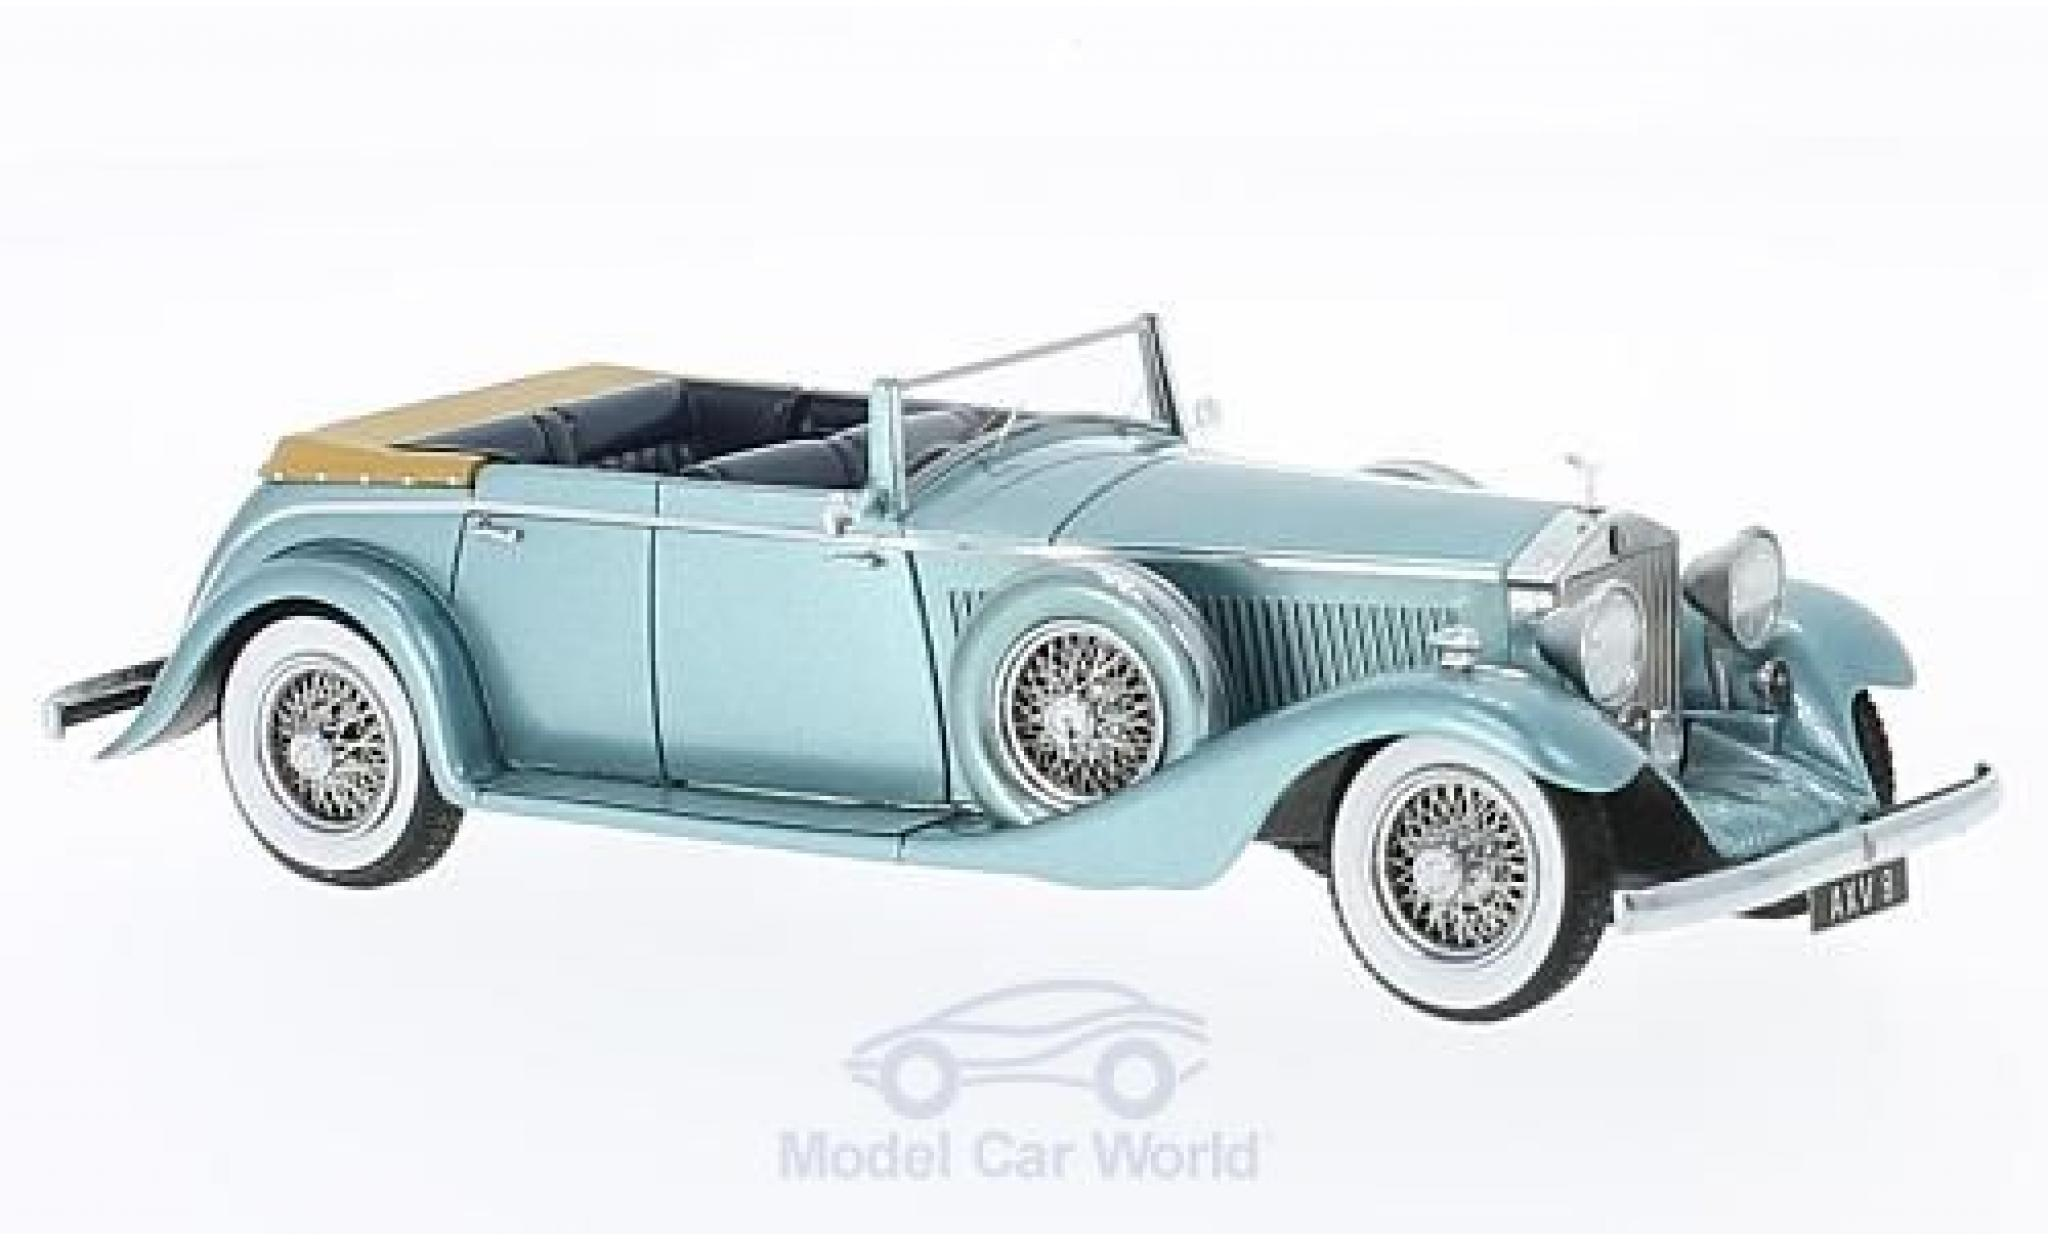 Rolls Royce Phantom 1/43 Matrix II Continental All-Weather Tourer metallise bleue 1934 Nubar Gulbenkian Hooper #7RY